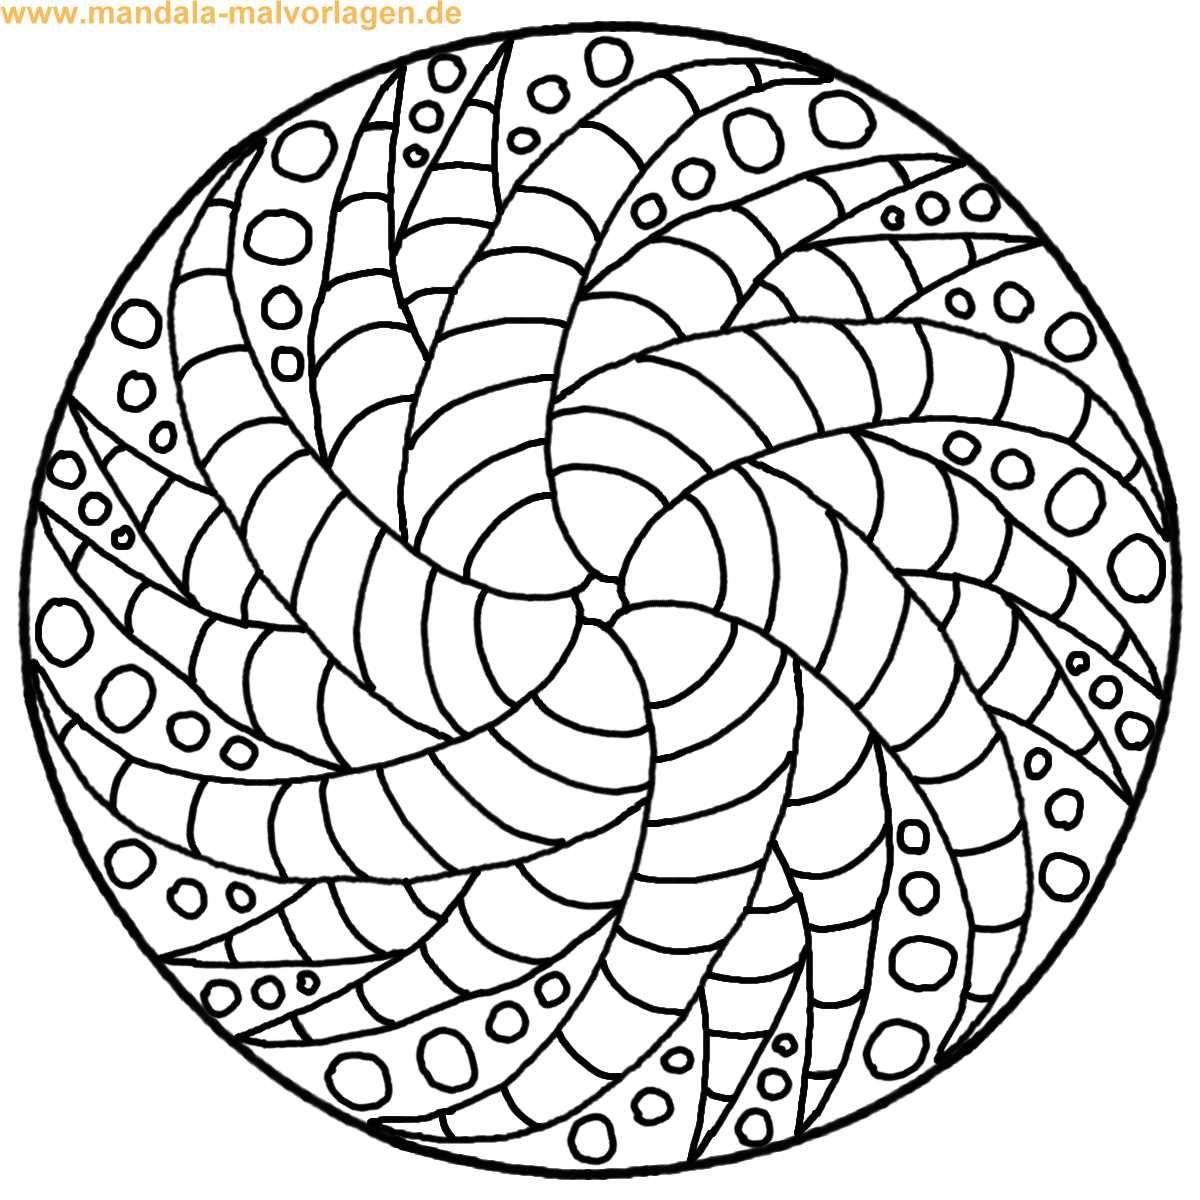 Mandala-malvorlagenimages4ausmal_mandala